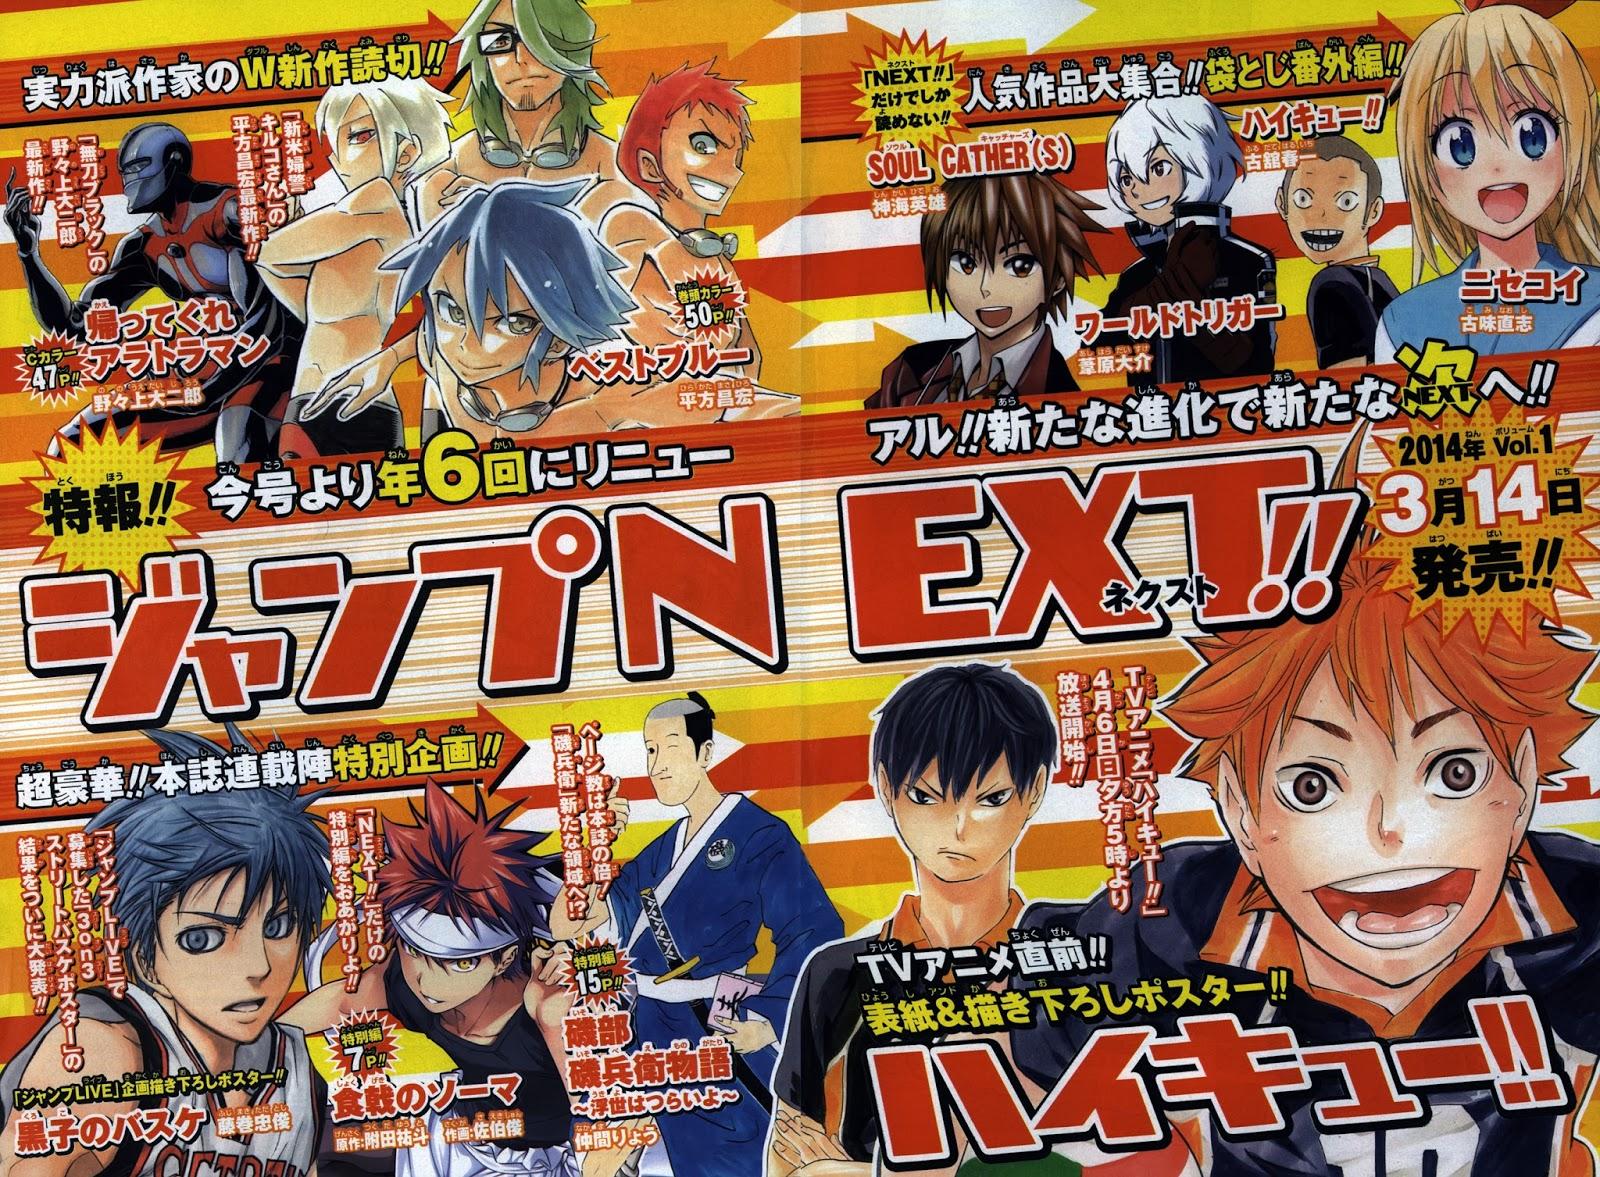 Naruto News: Table of Contents 2014 - Weekly Shonen Jump ...